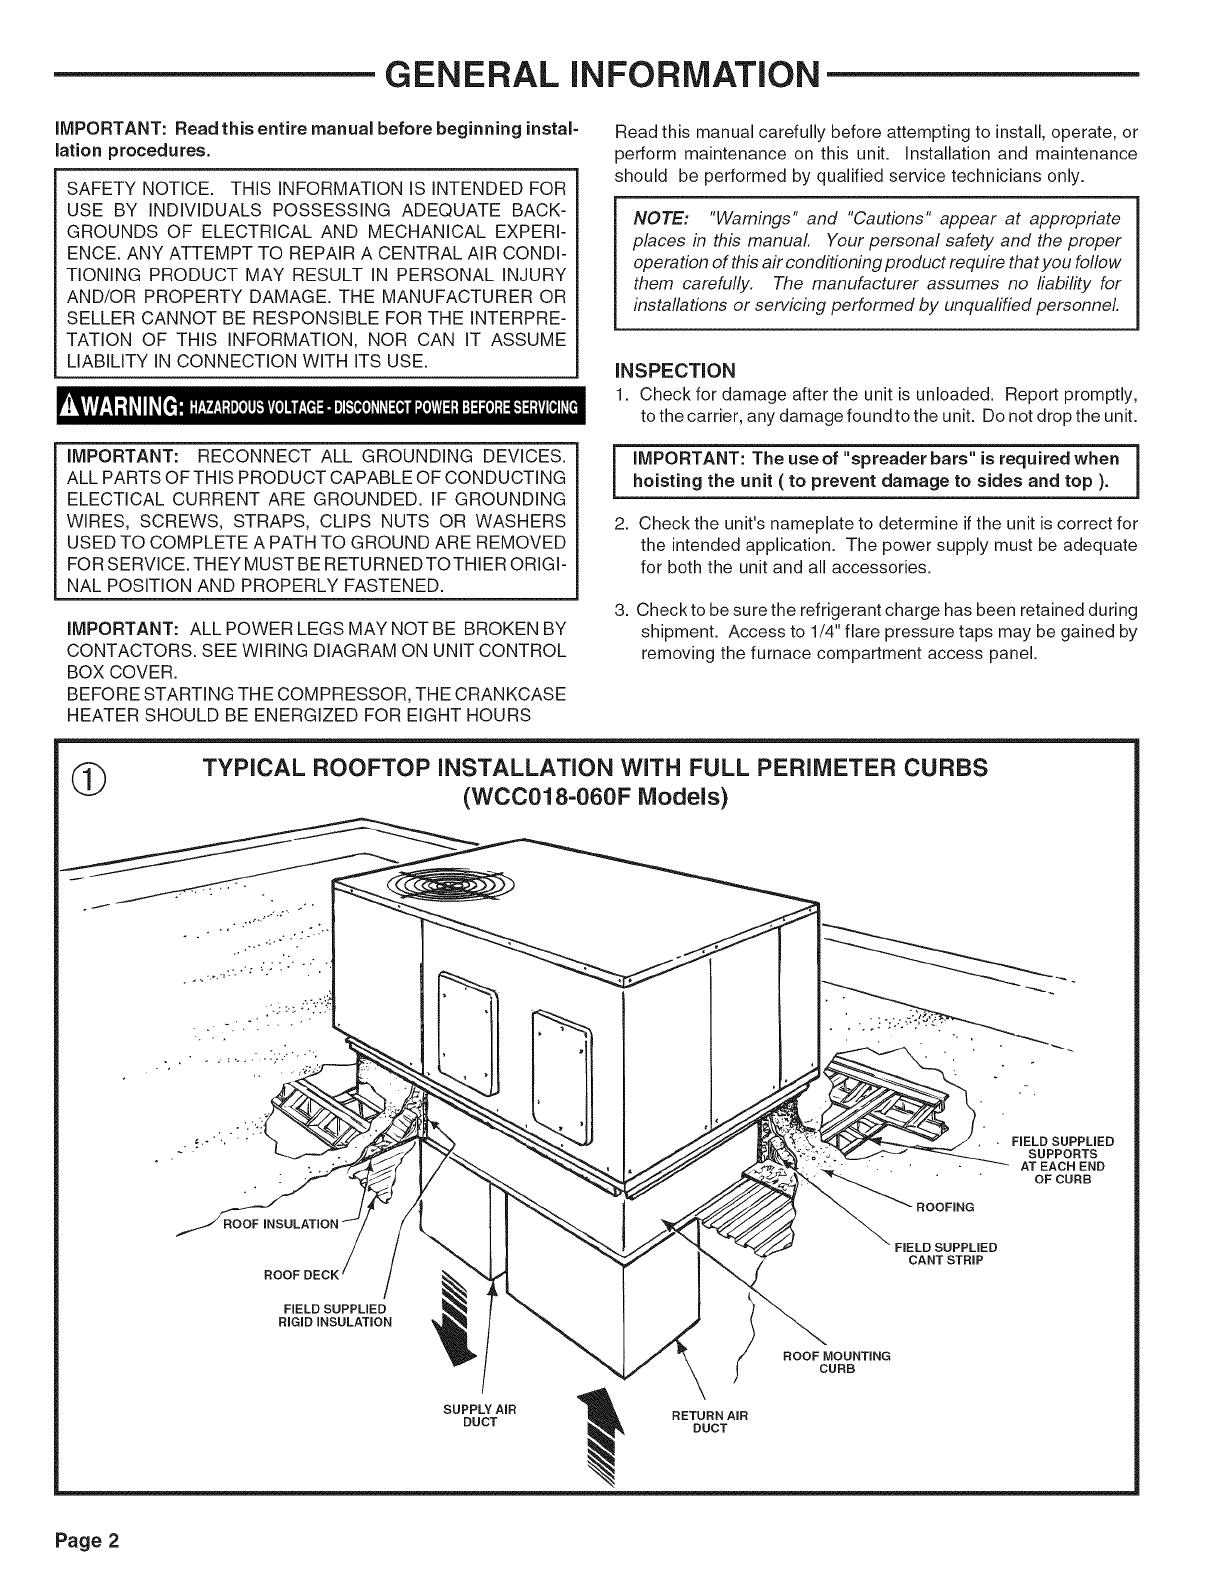 TRANE Package Units(both Units Combined) Manual L0905292UserManual.wiki